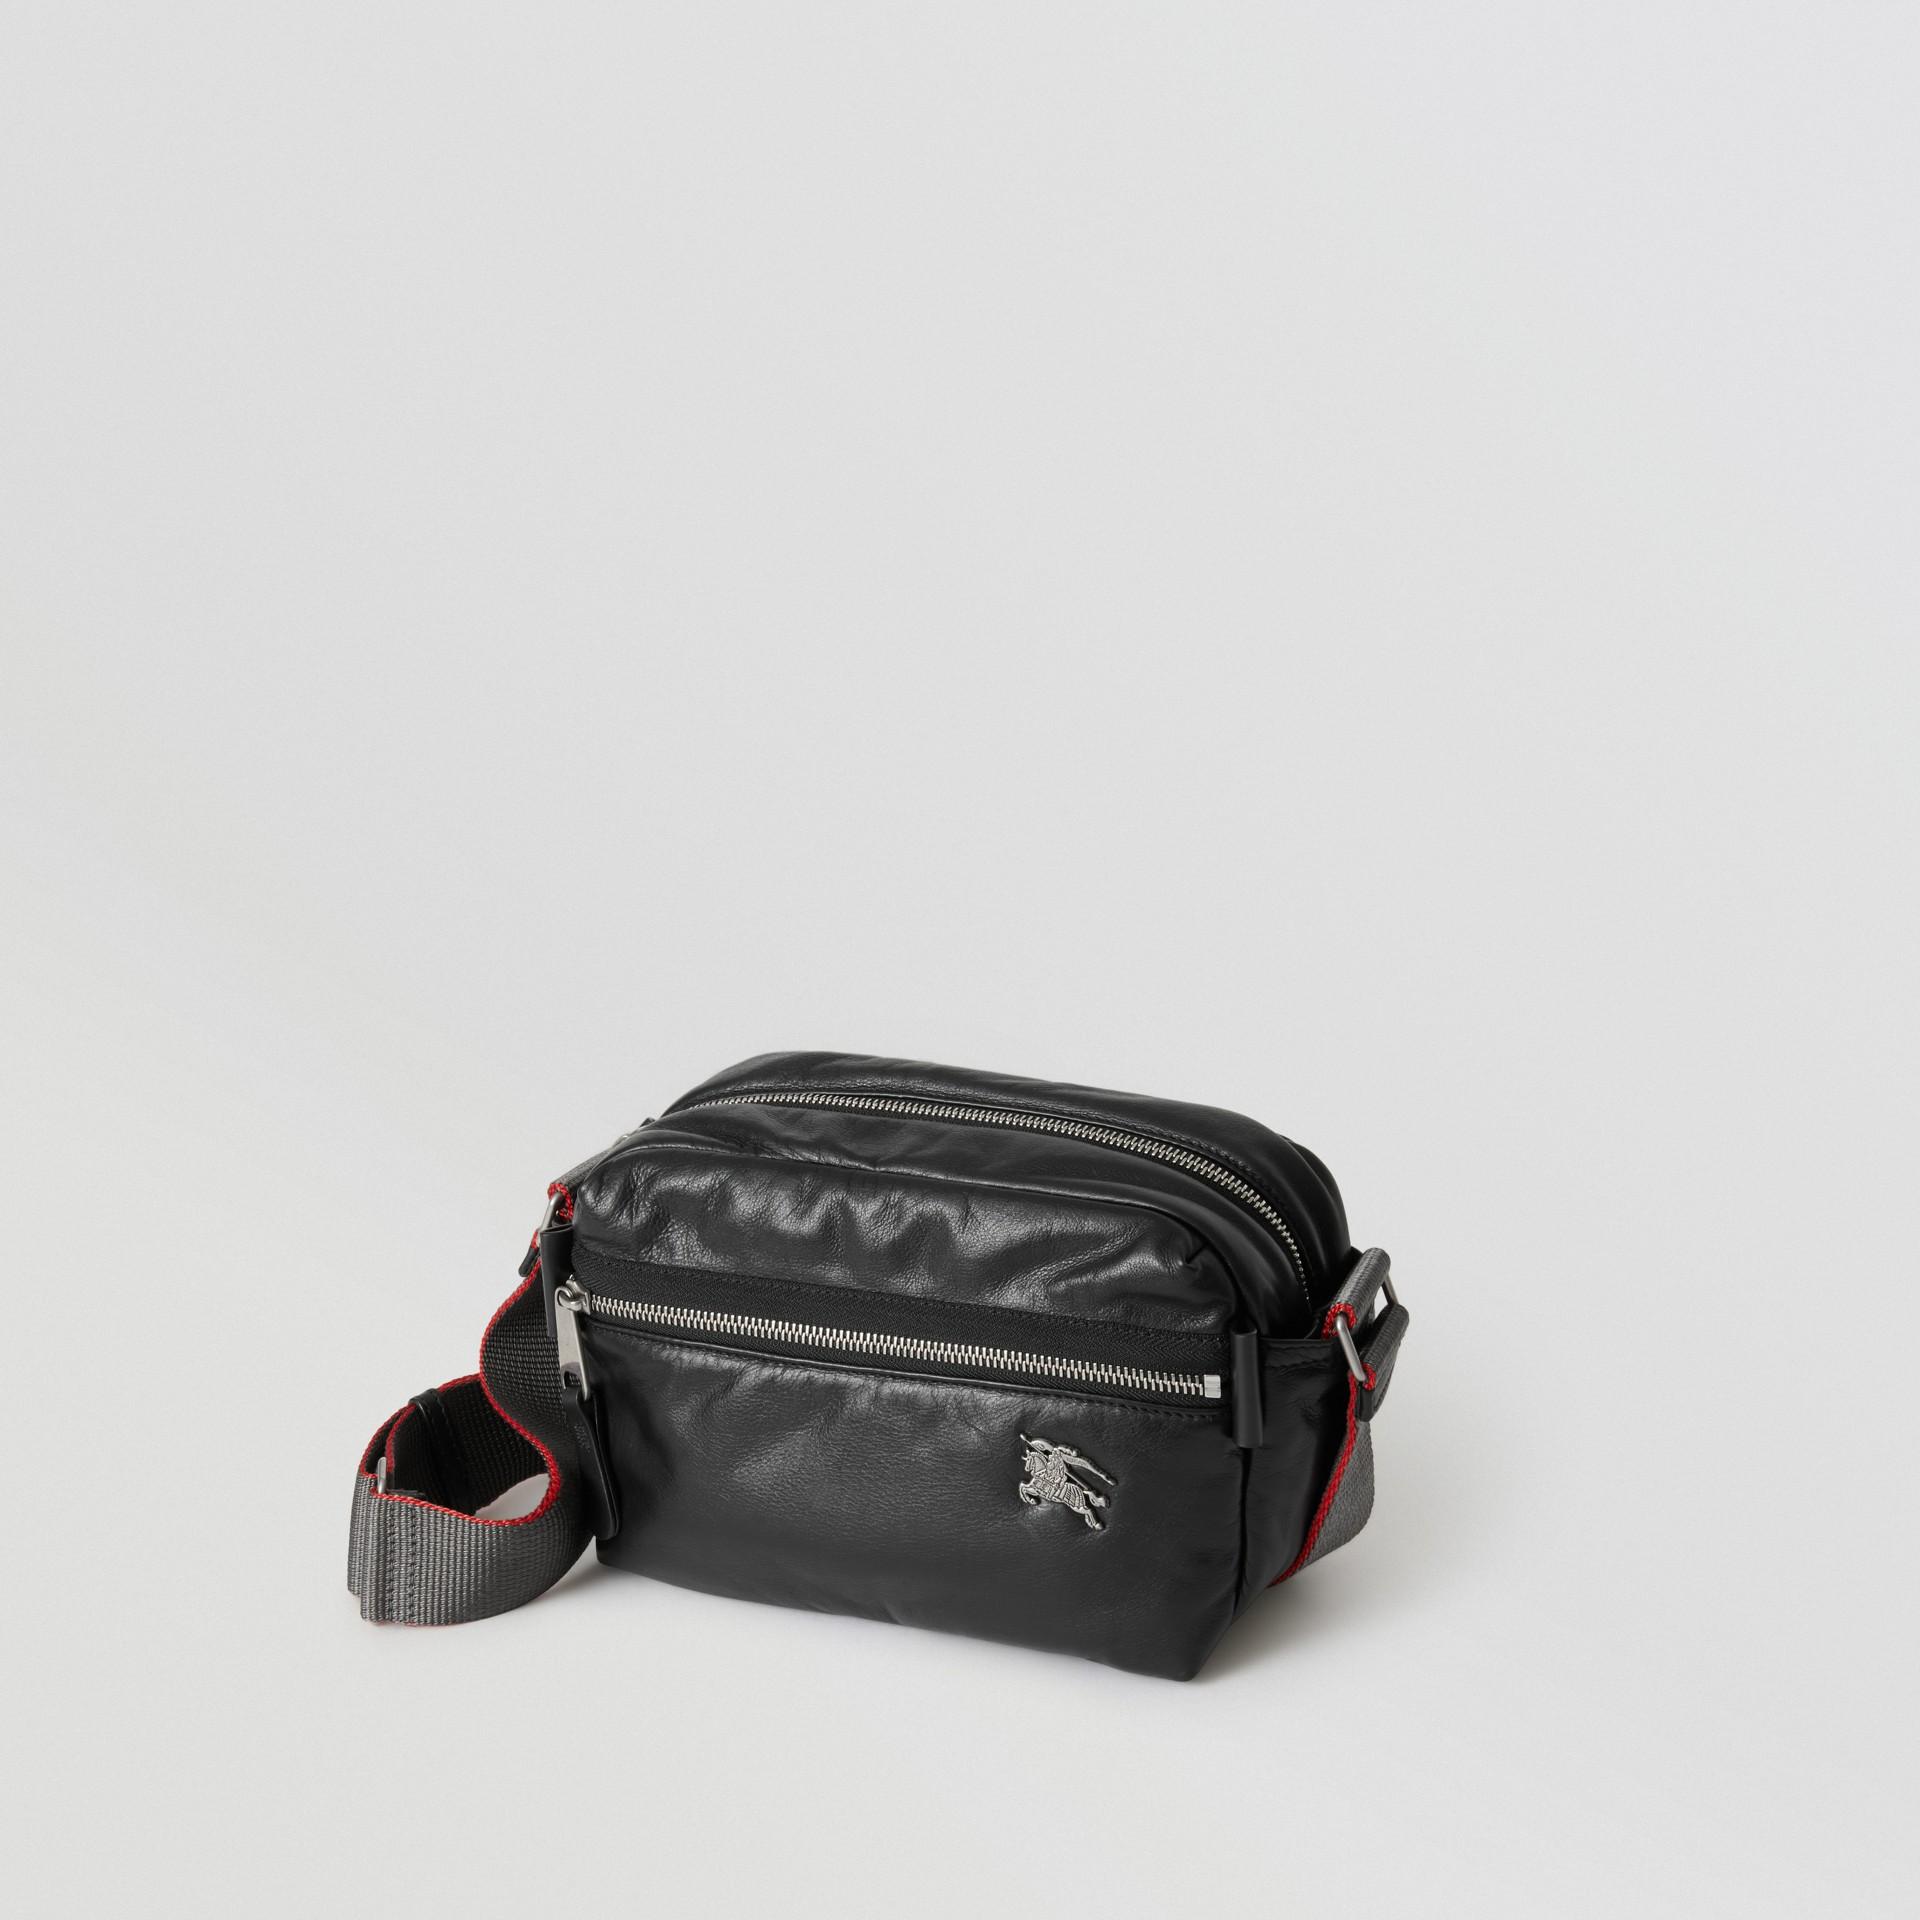 EKD Nappa Leather Crossbody Bag in Black - Men | Burberry Hong Kong - gallery image 2